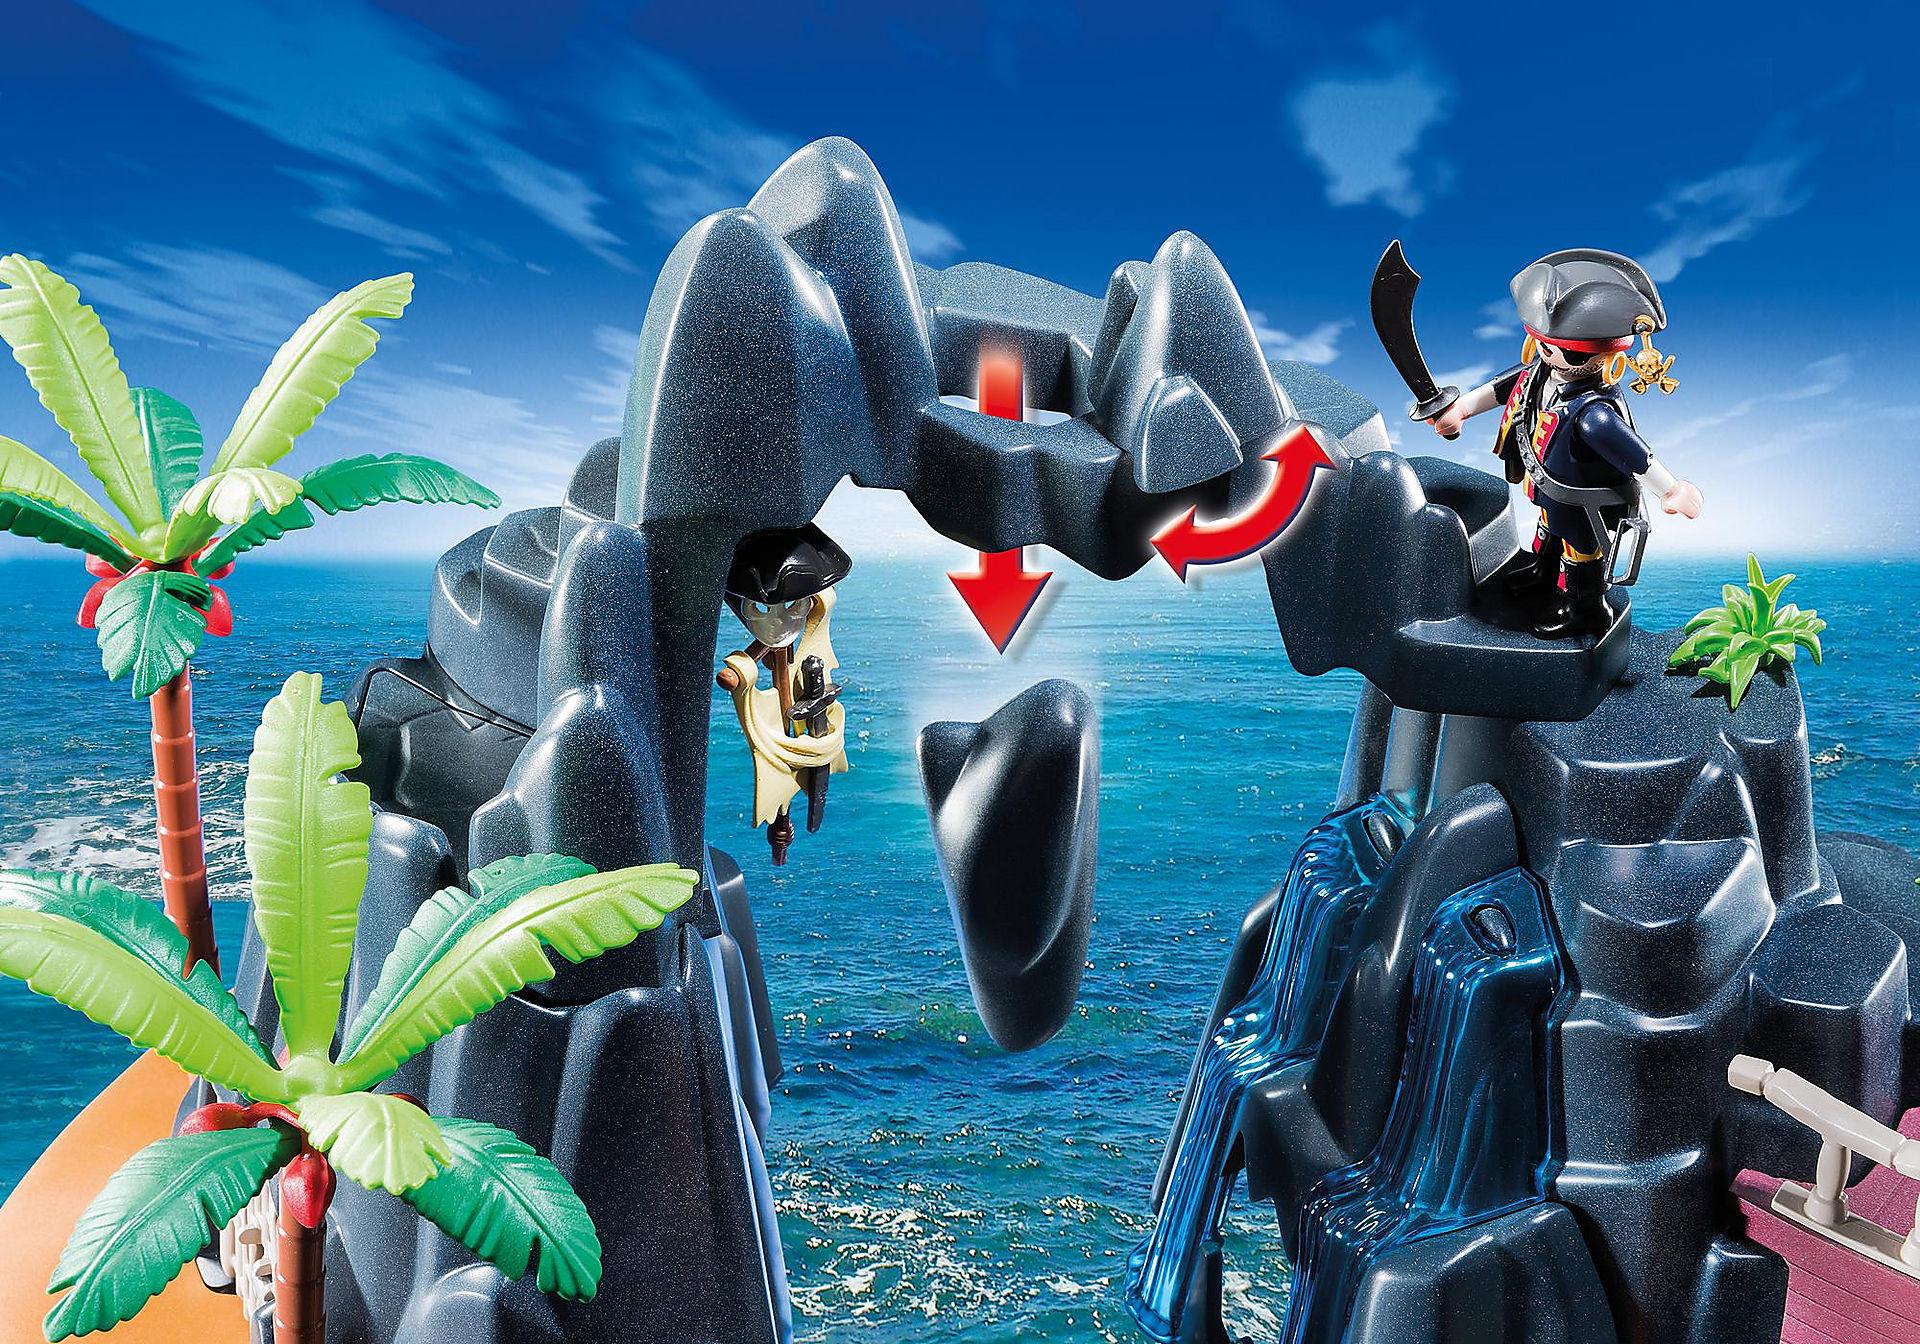 http://media.playmobil.com/i/playmobil/6679_product_extra5/Πειρατικό νησί θησαυρού